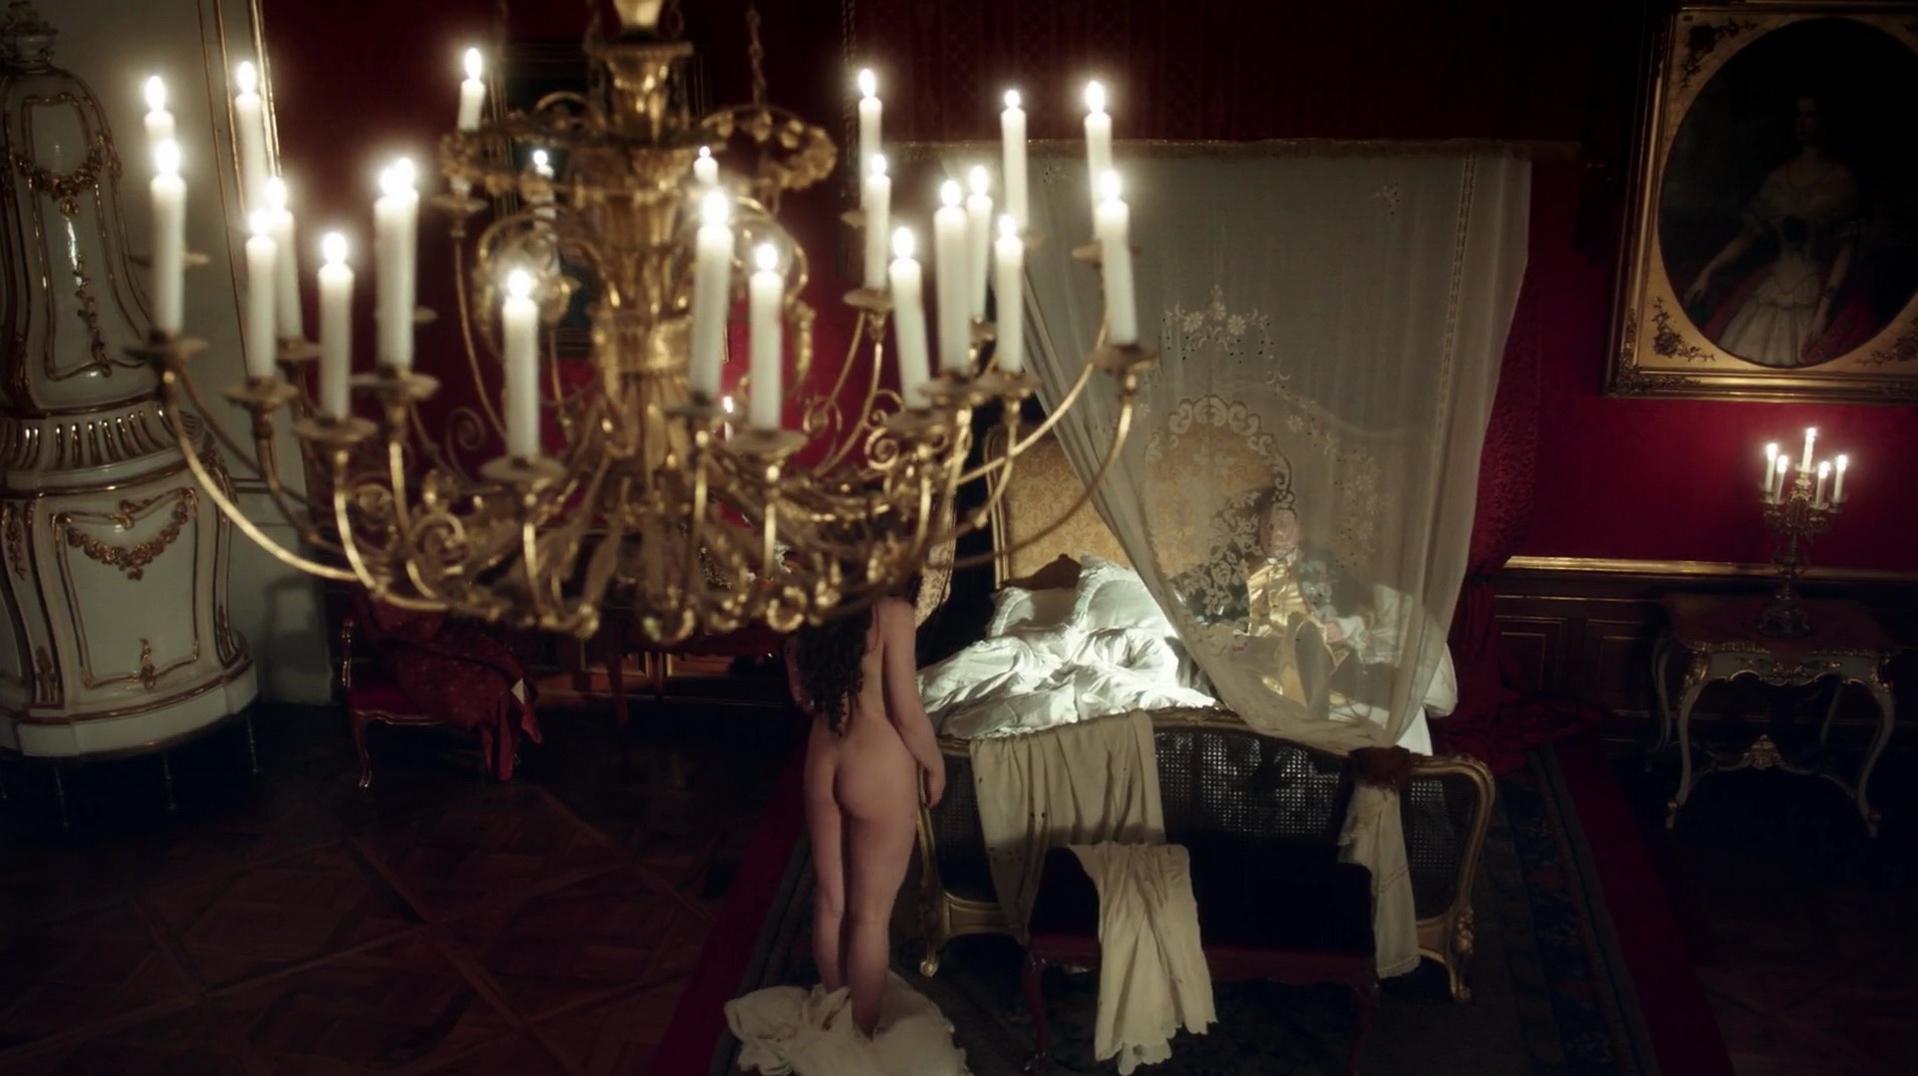 Marina Aleksandrova nude - Ekaterina s01e06 (2014)